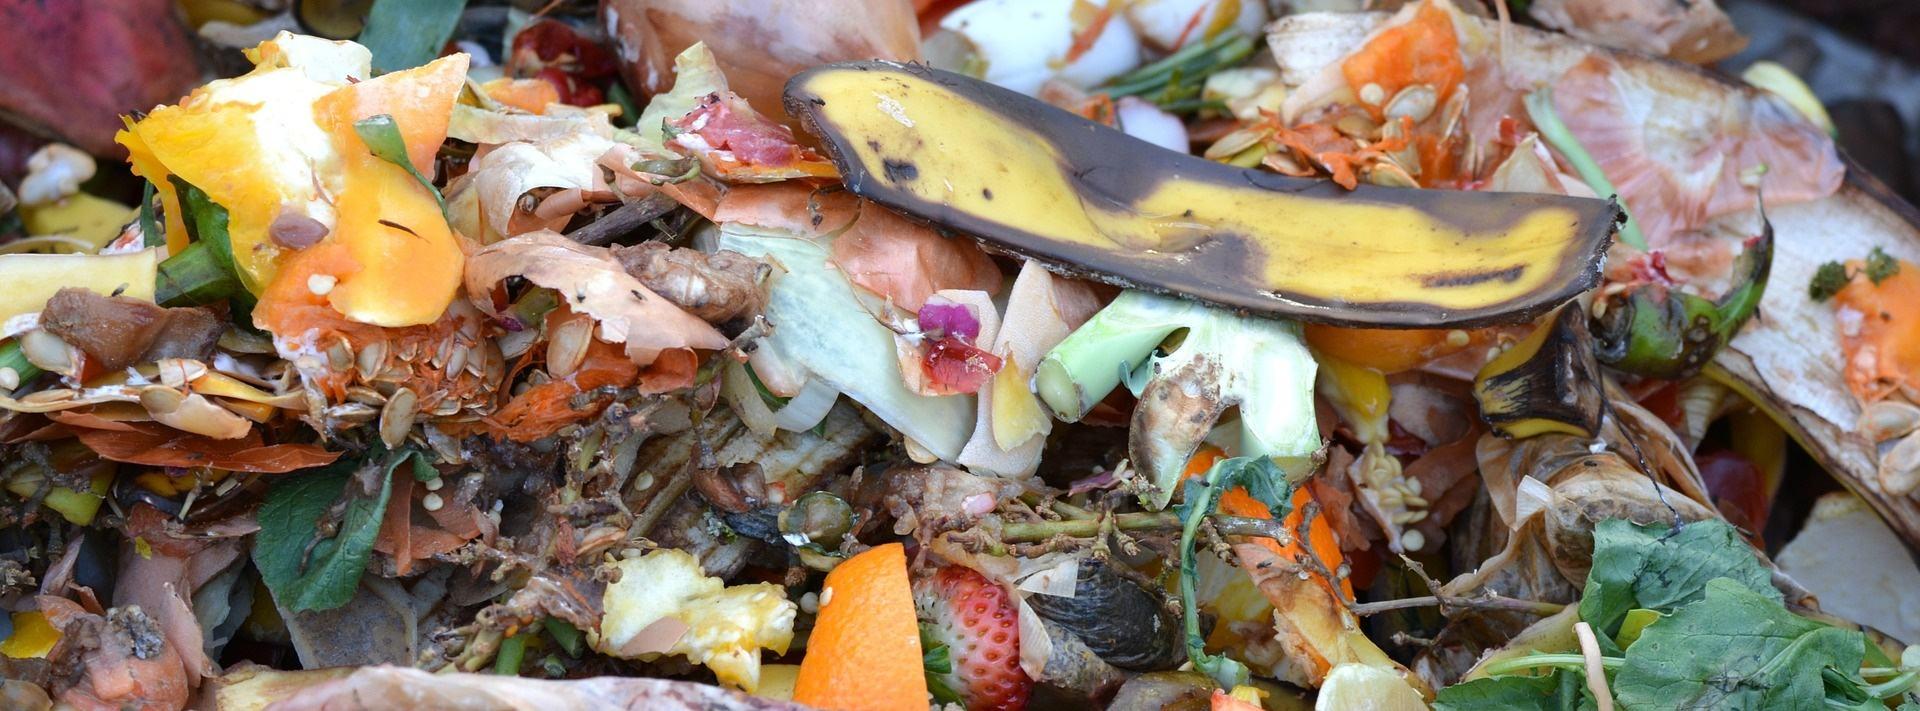 compostagem